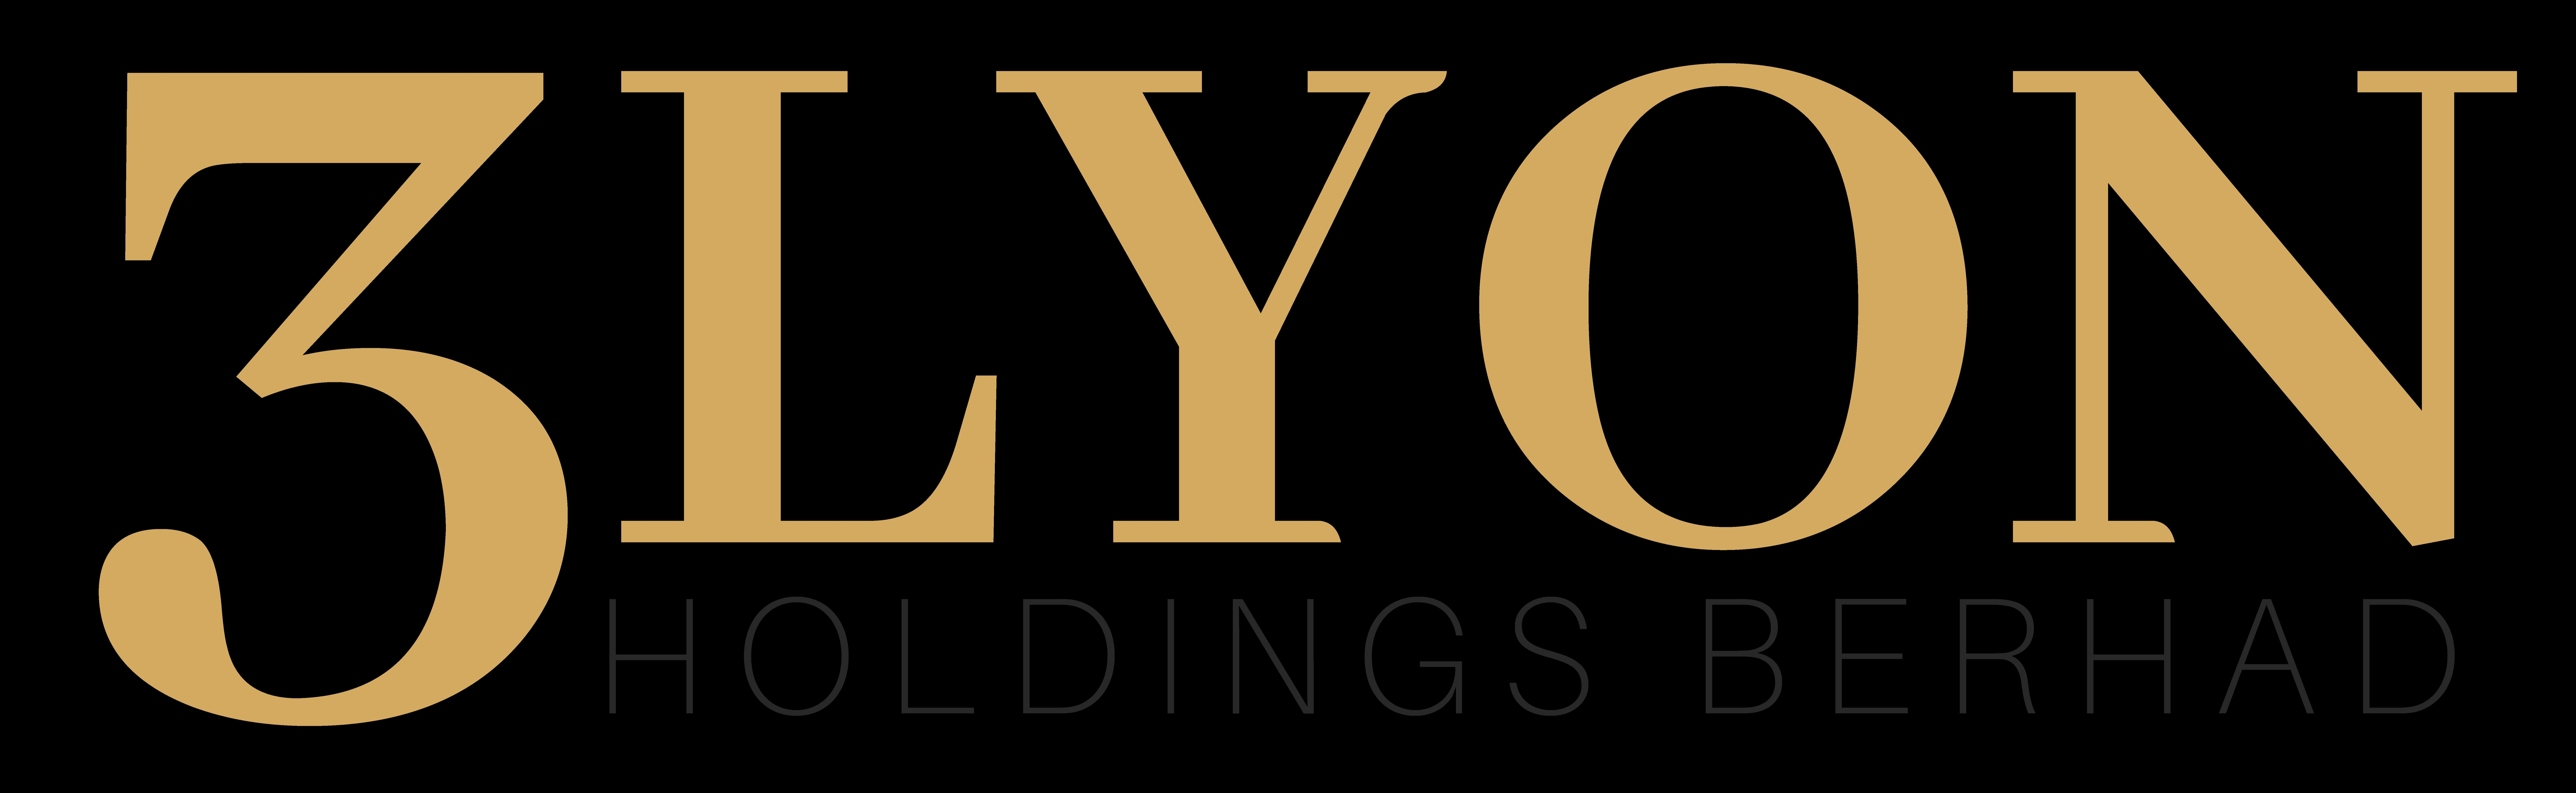 3Lyon Holdings Berhad